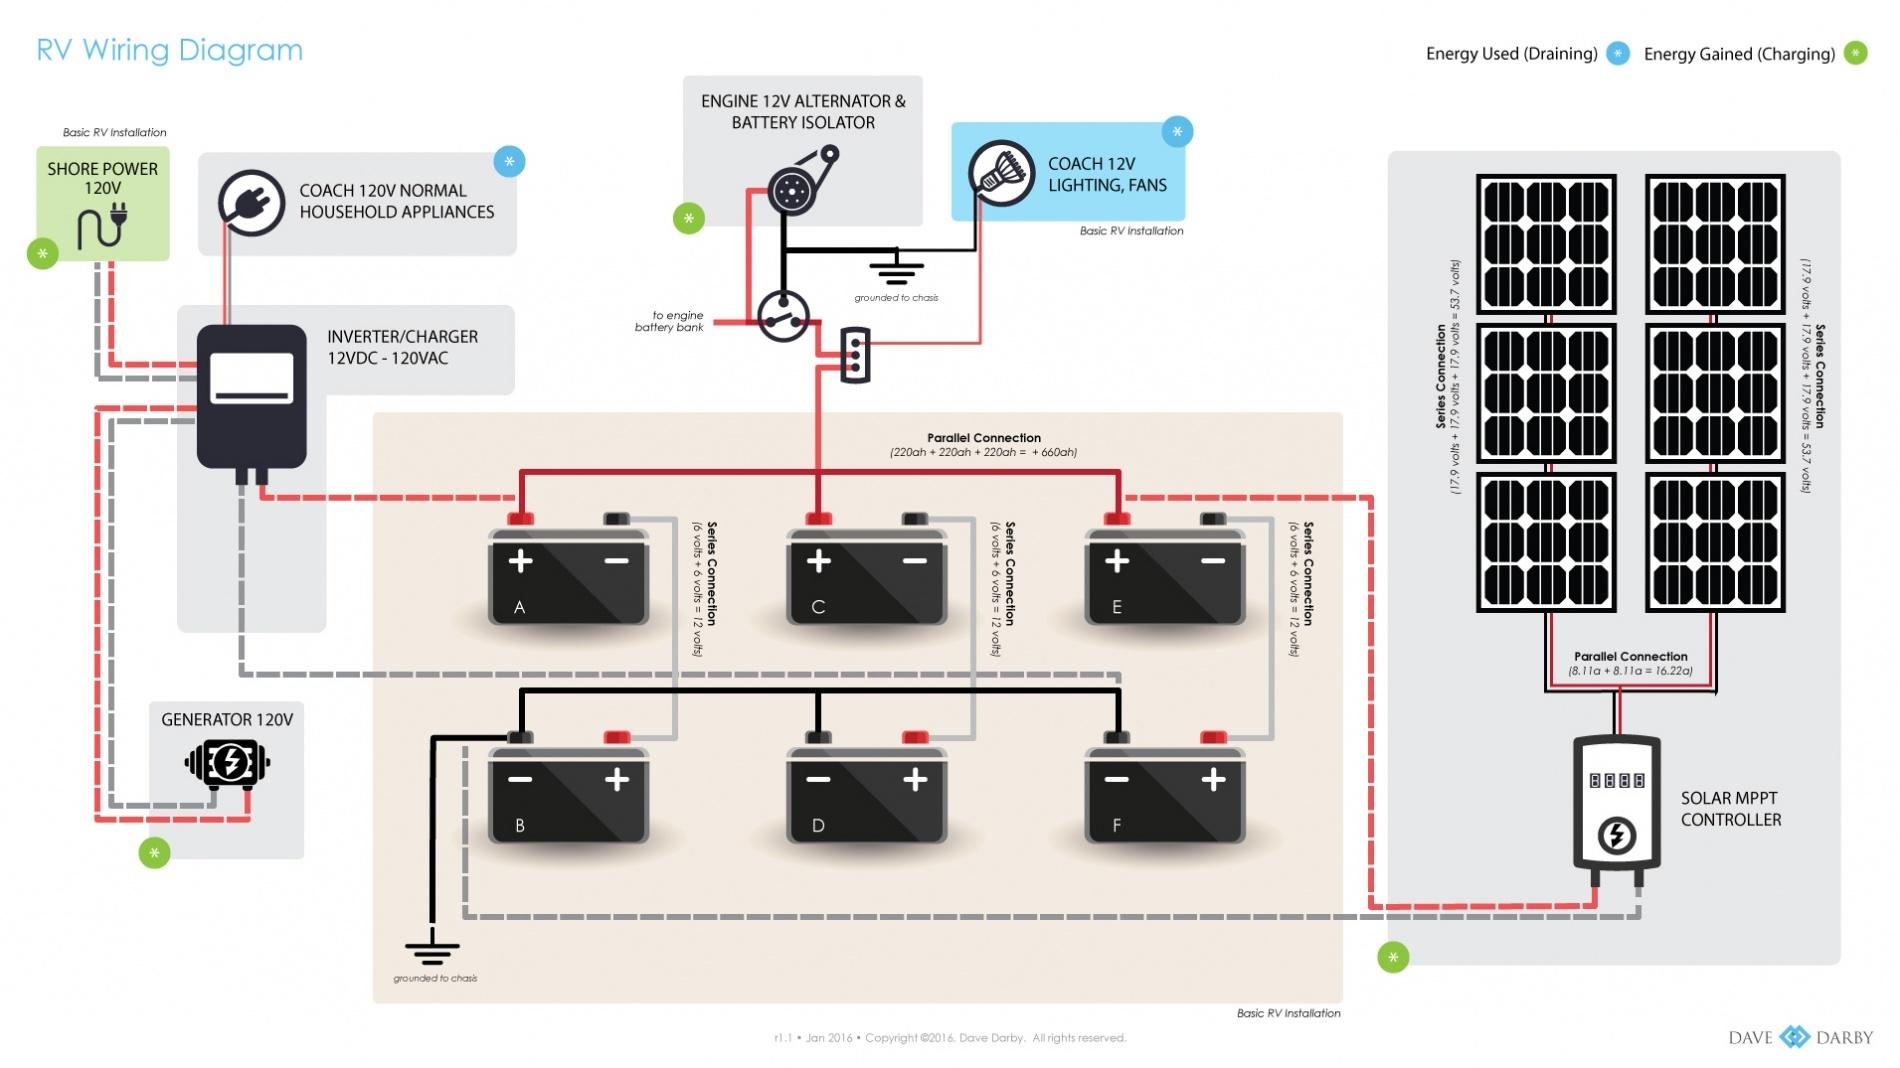 hight resolution of rv solar panel installation wiring diagram collection wiring diagram for rv solar system solar panel